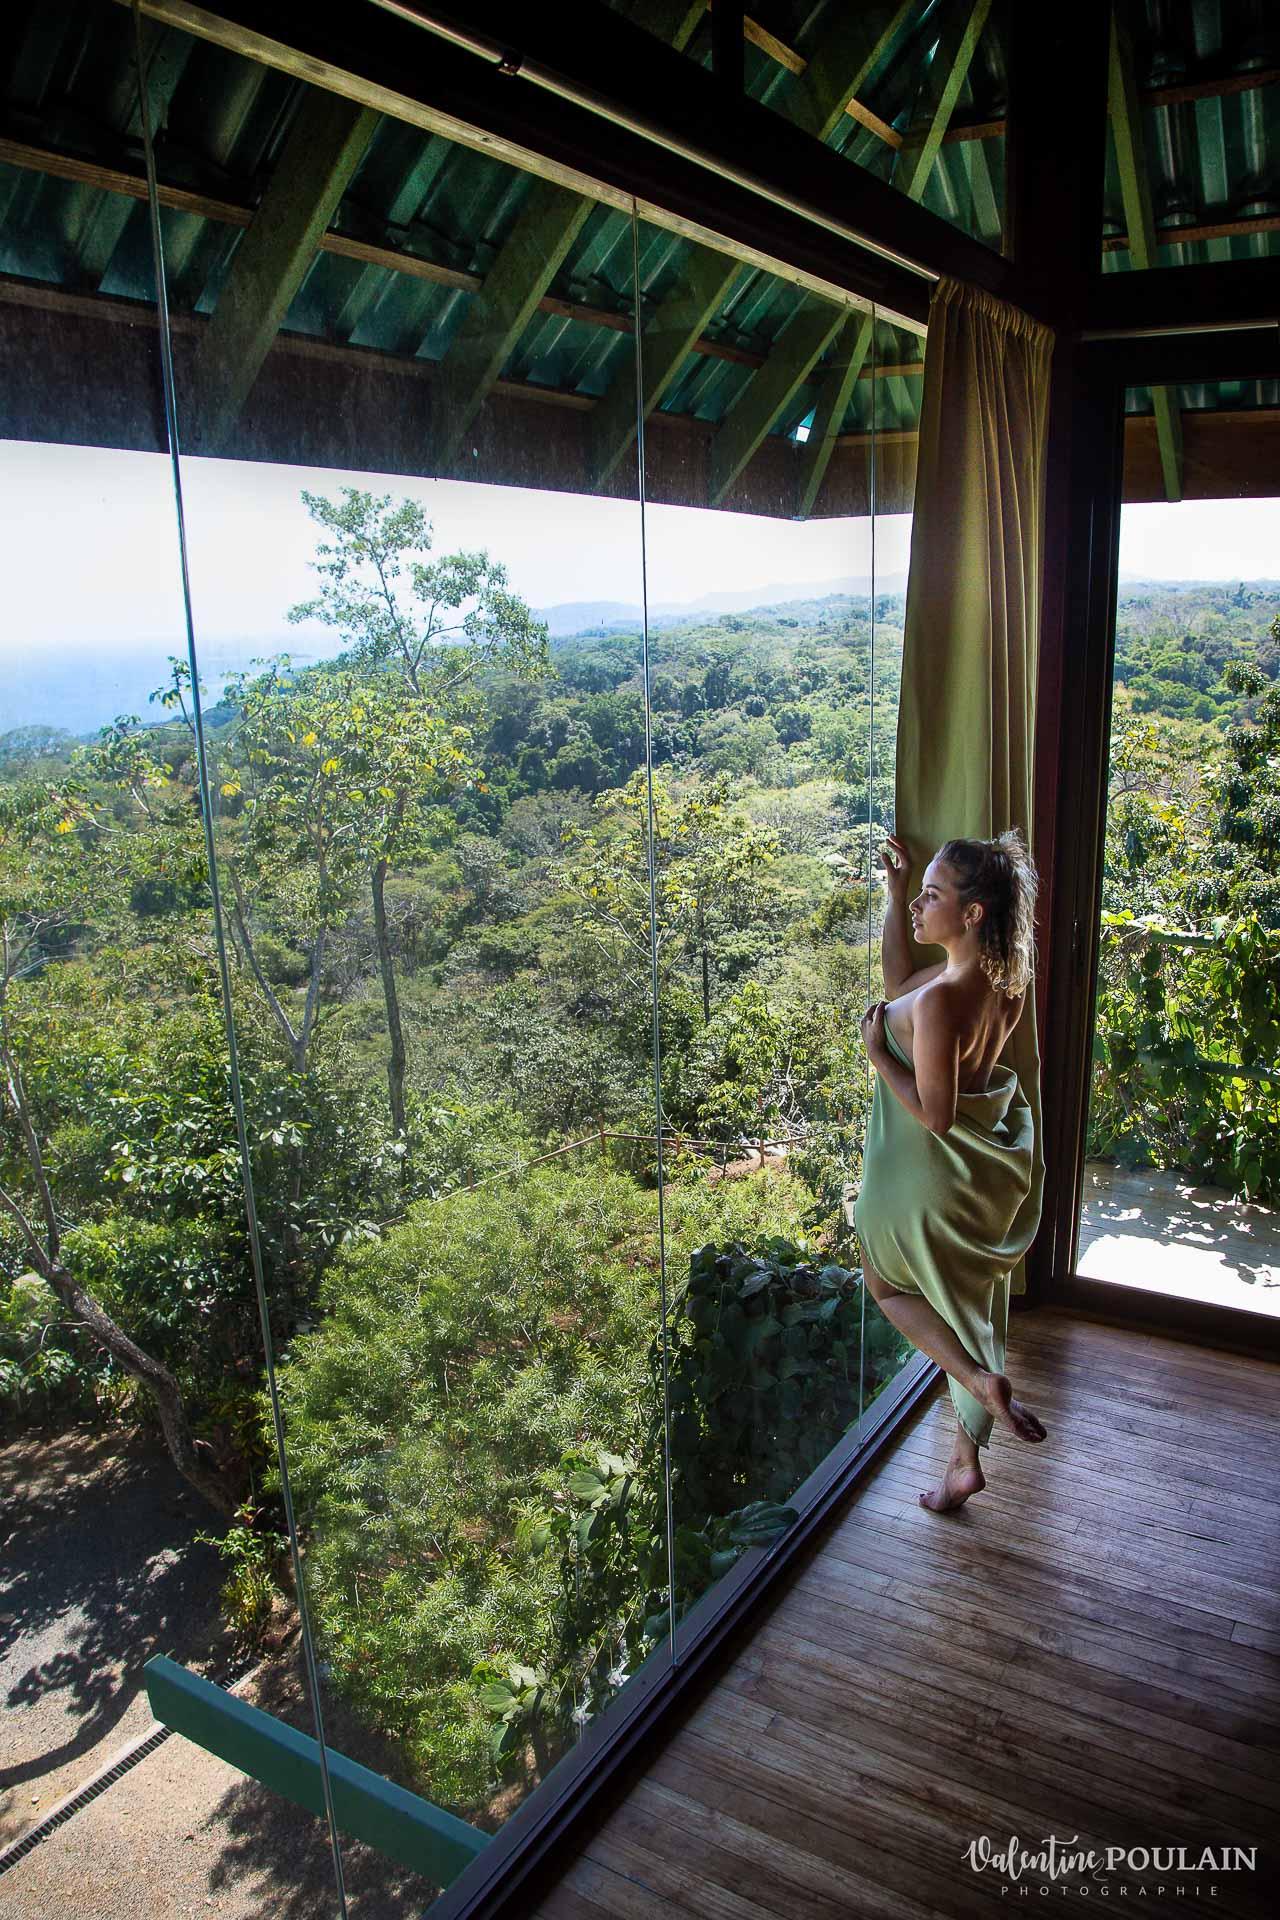 Photo Hotel Costa Rica ANAMAYA_ Valentine Poulain view